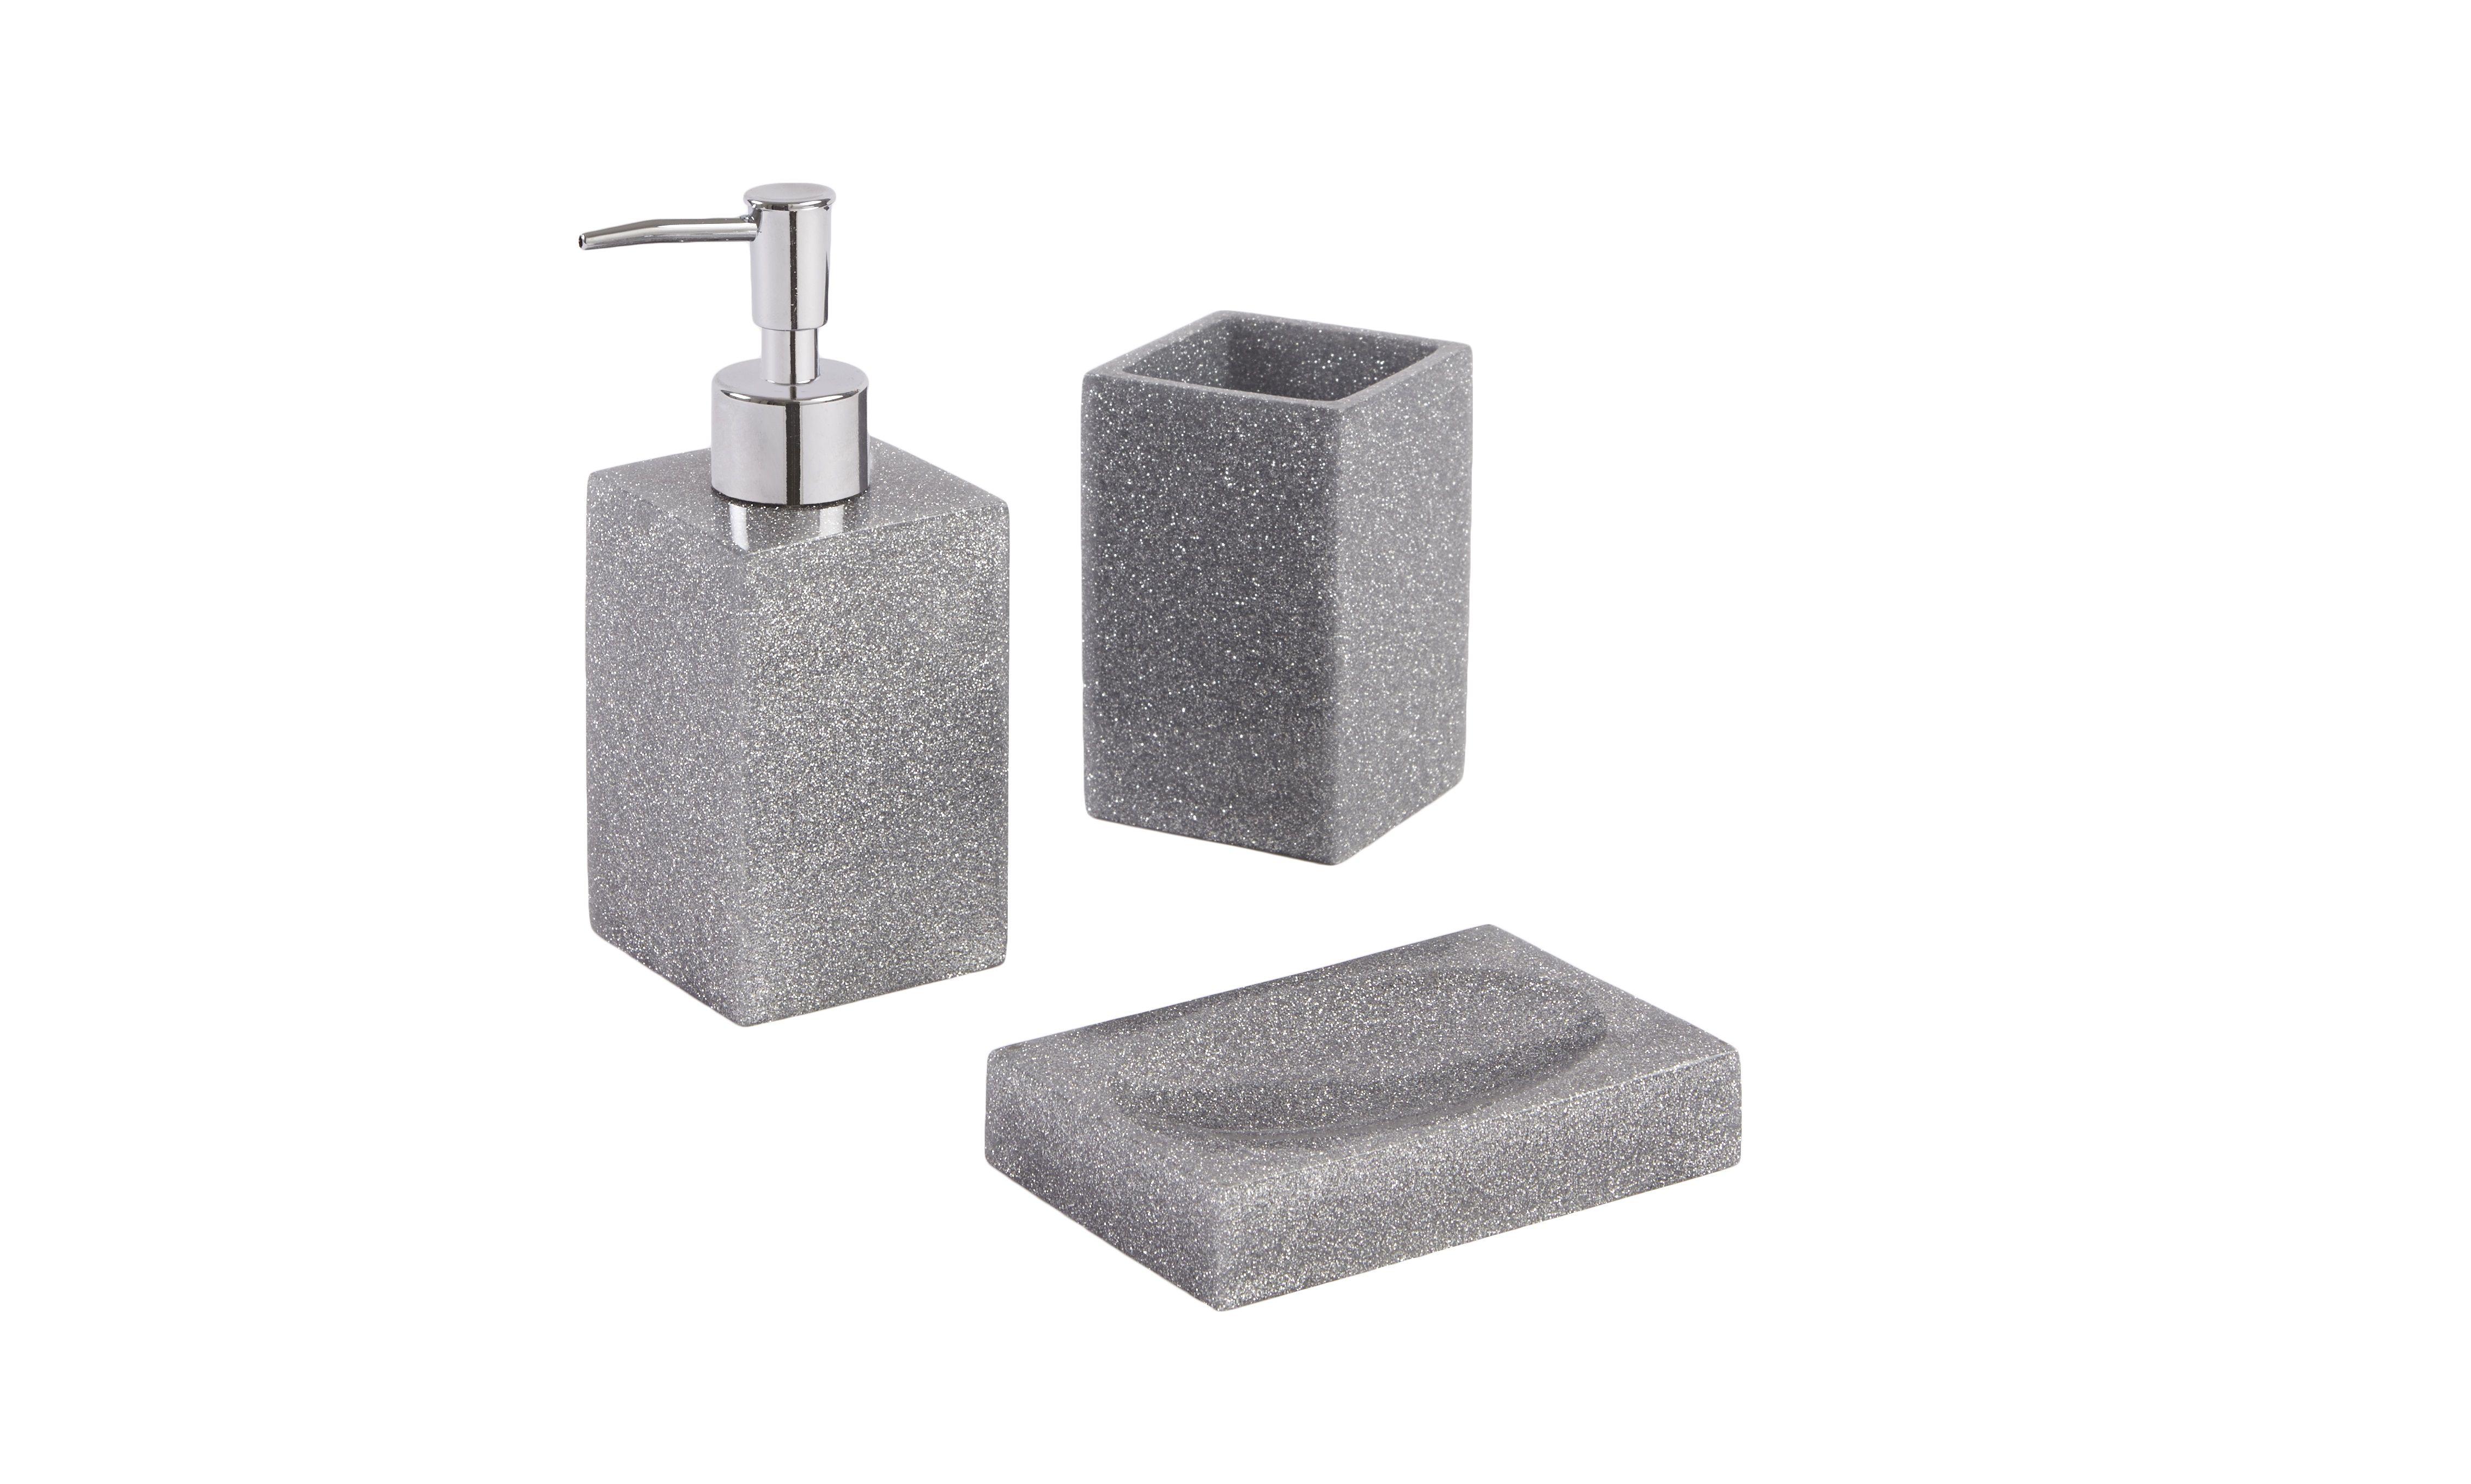 Glitter bathroom accessories - Bathroom Accessory Sets Bathroom Accessories Bathroom Black Glitter Bathroom Accessories